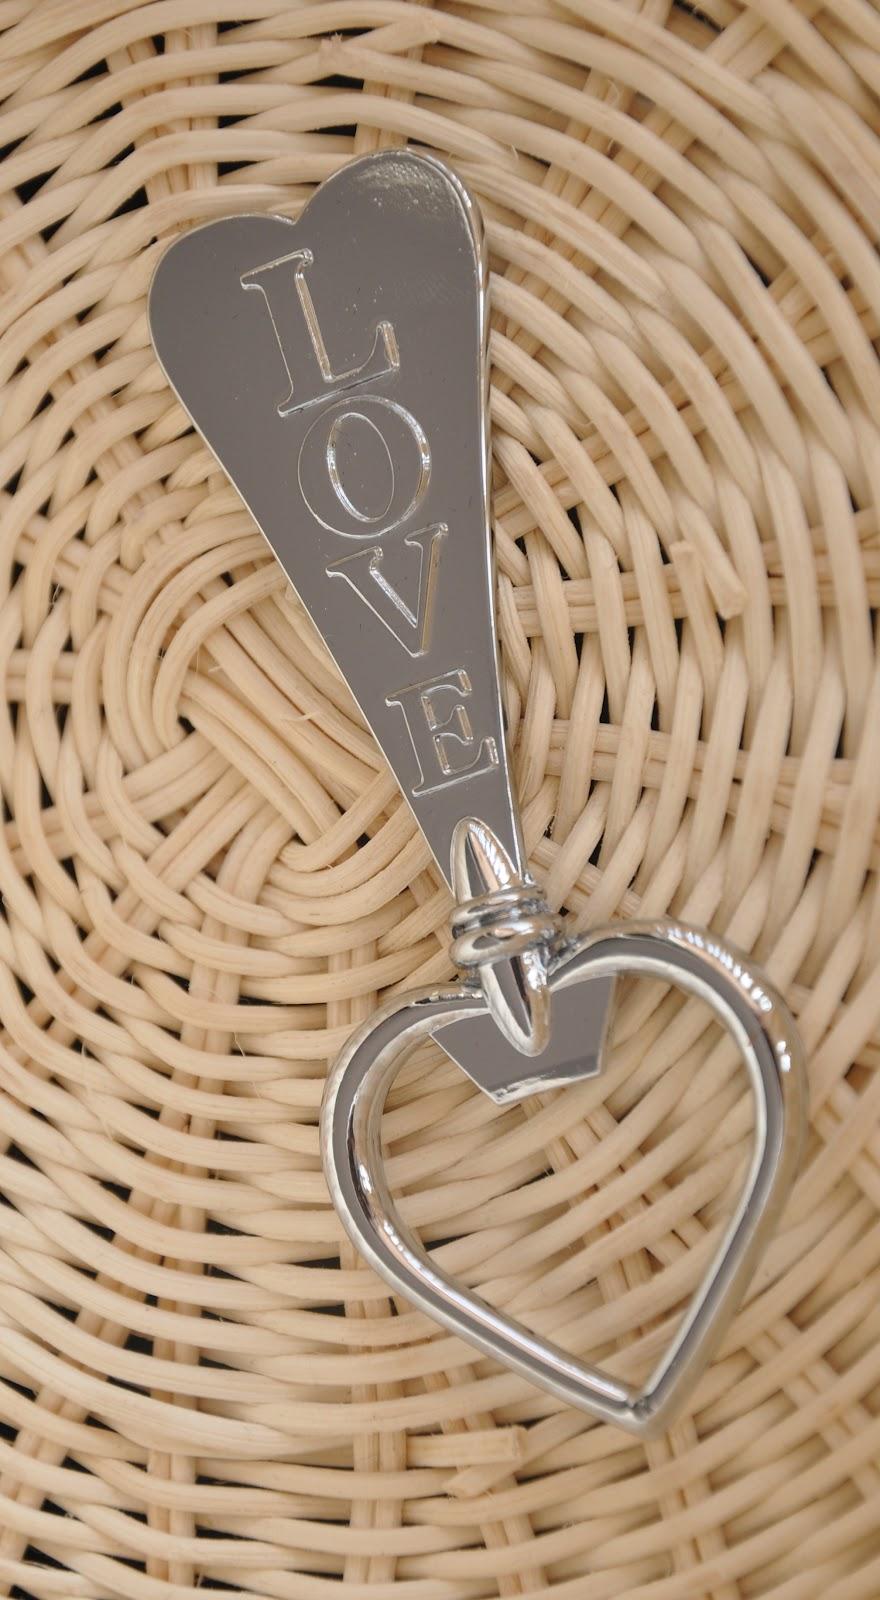 WED1003-Sweetest-Love-Bottle-Opener2 20 unique wedding giveaways ideas